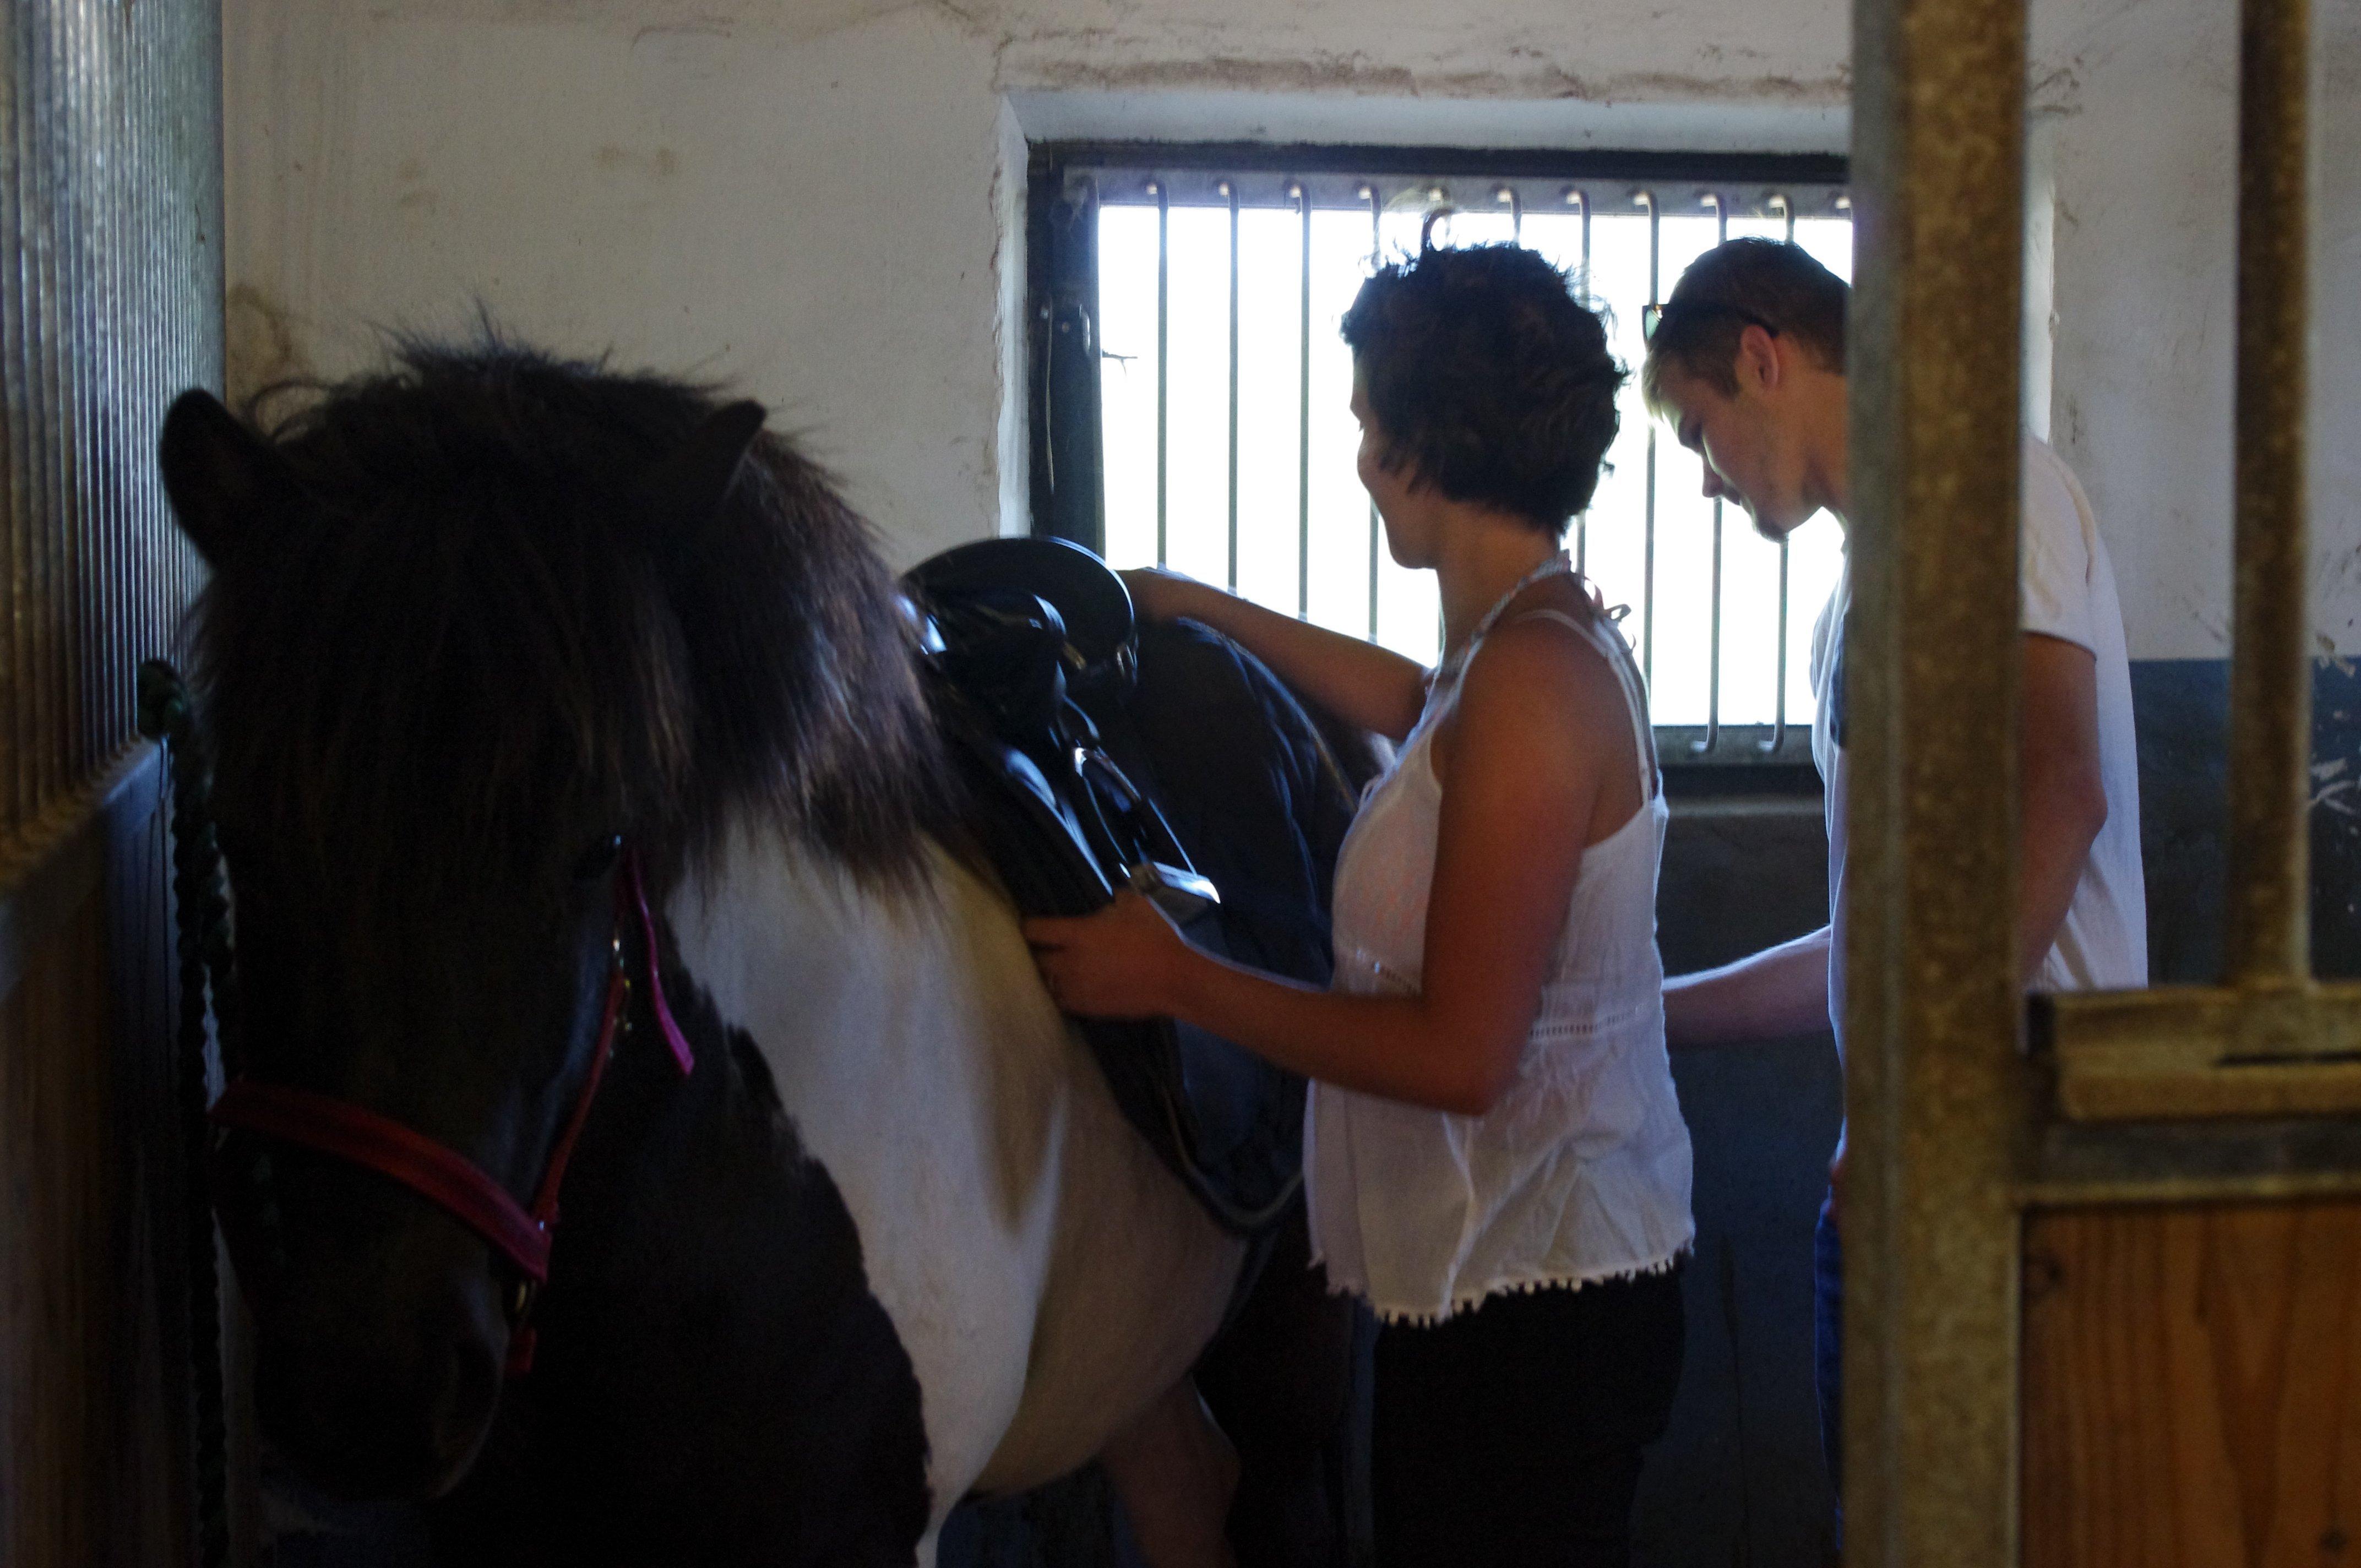 leana-emil-fit-saddle-tora Galleri-sparrarpislandshastar.com | 2020